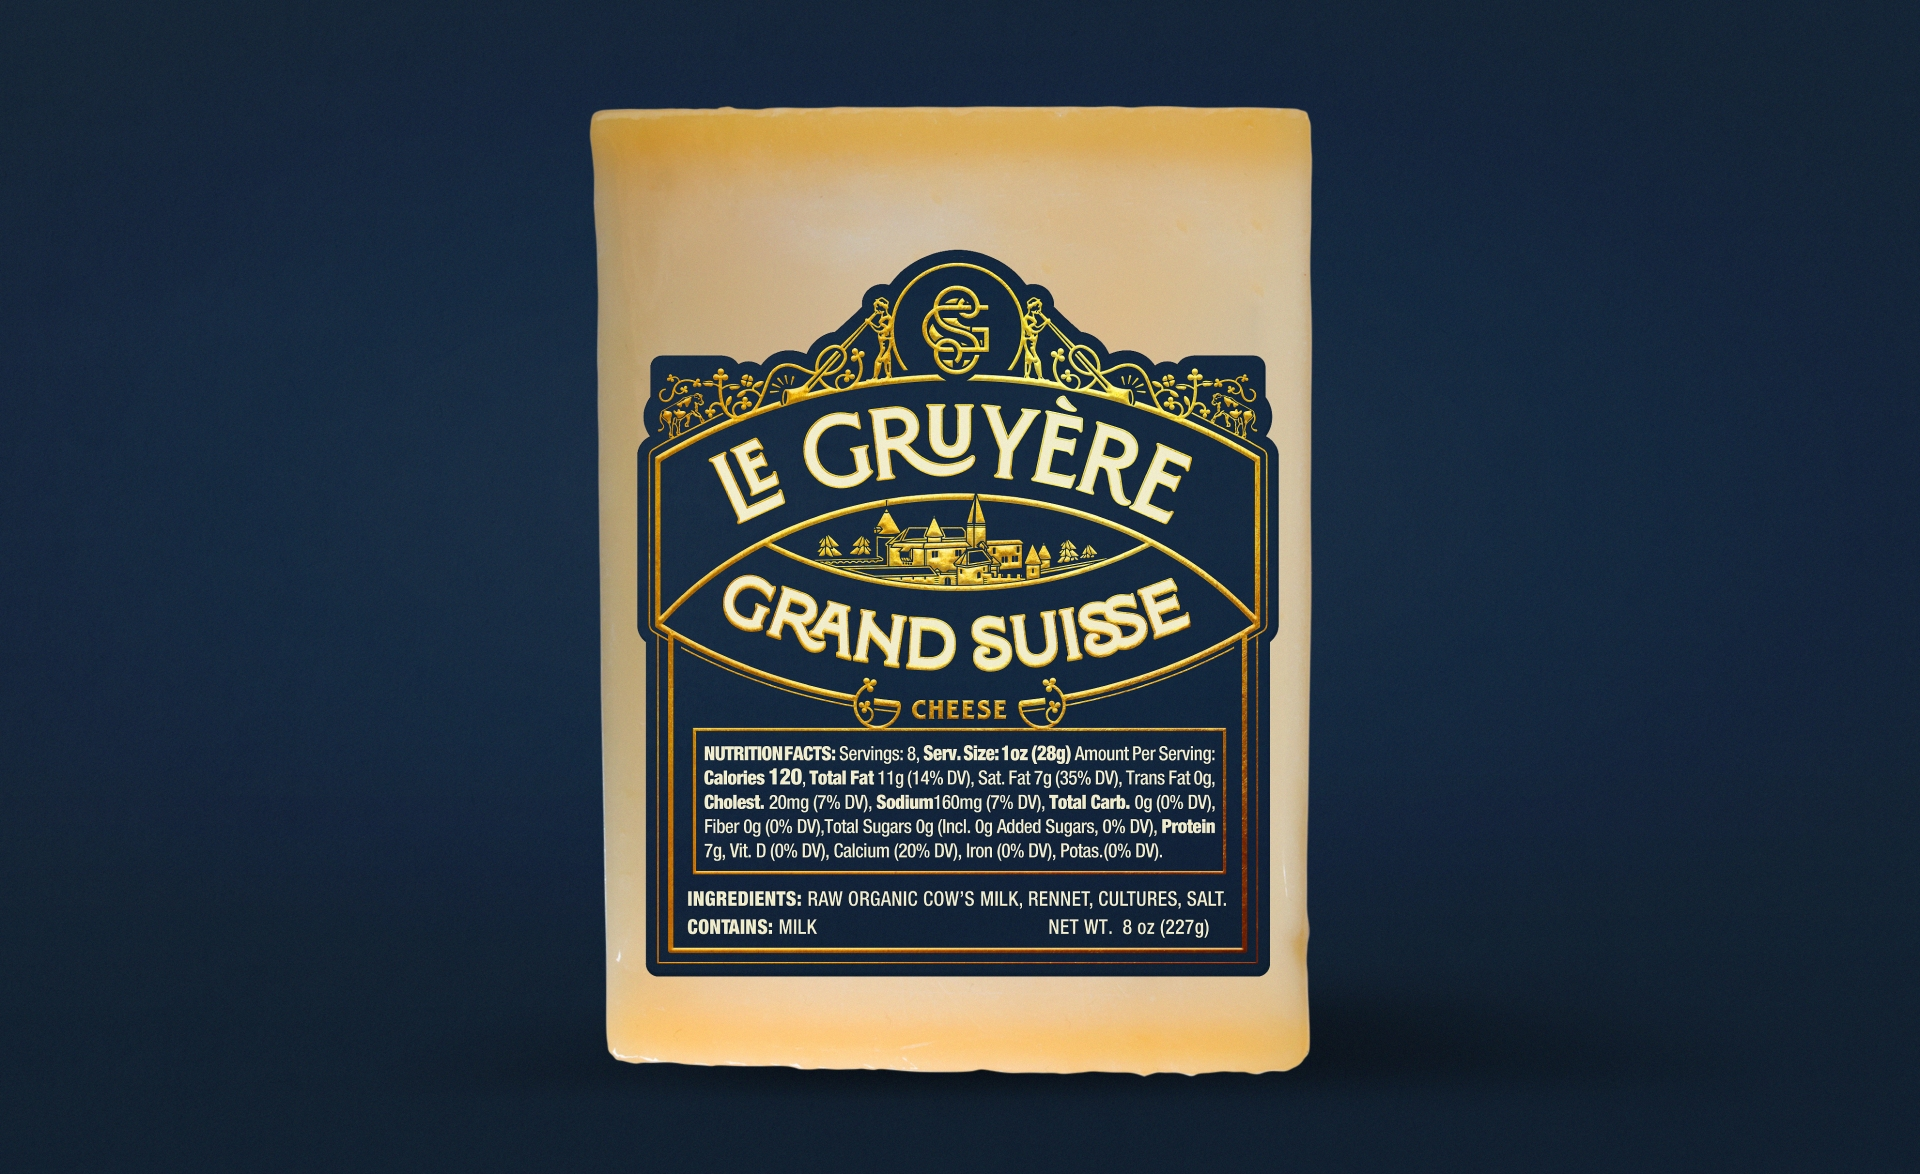 label-cheese-gruyere-preview-grand-suisse-close-zeki-michael-design-branding-studio-packaging-red copy